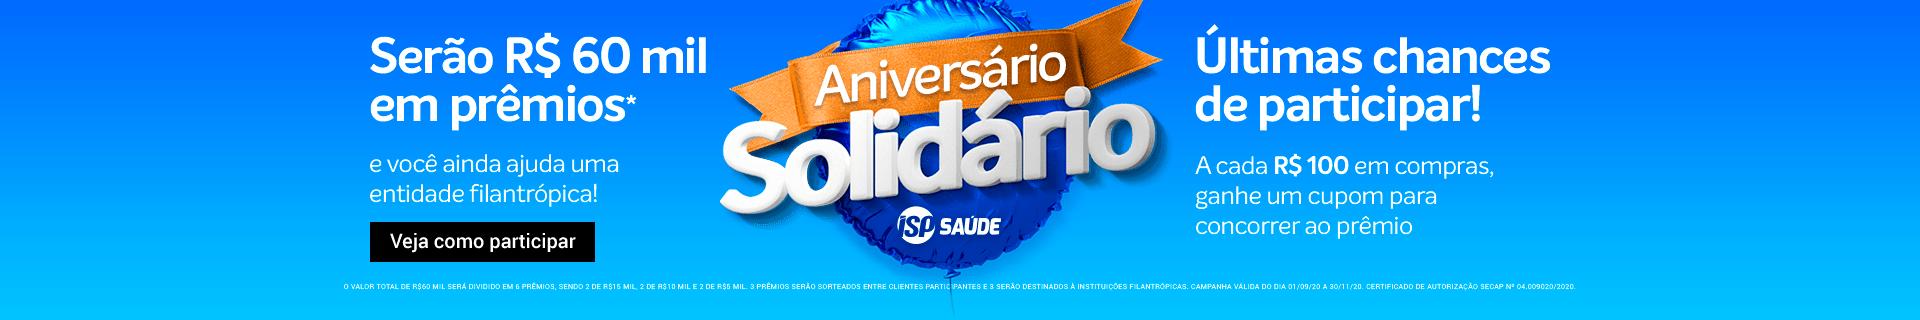 Aniversário ISP Saúde